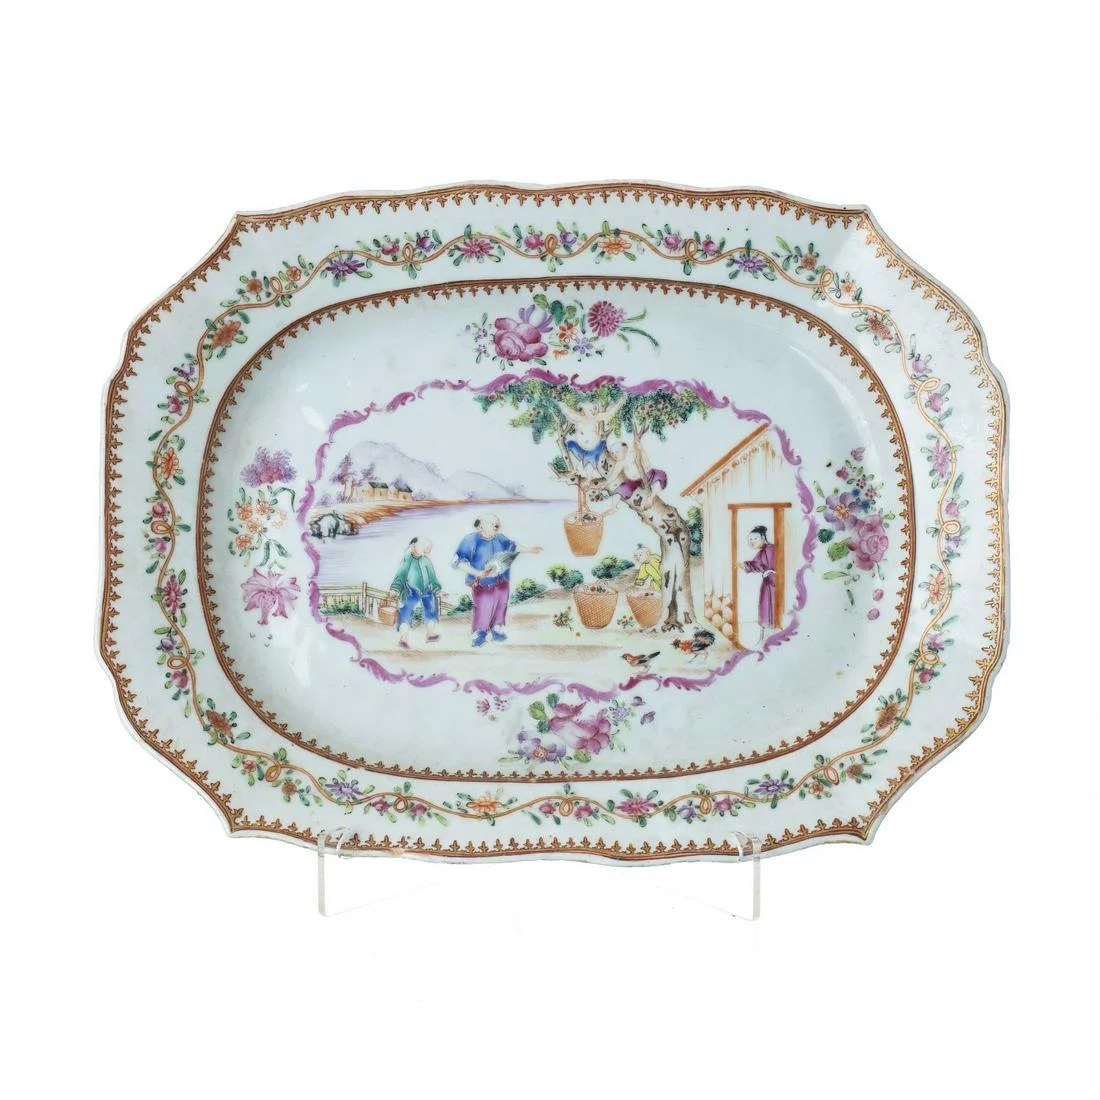 'Mandarin' platter in Chinese porcelain, Qianlong